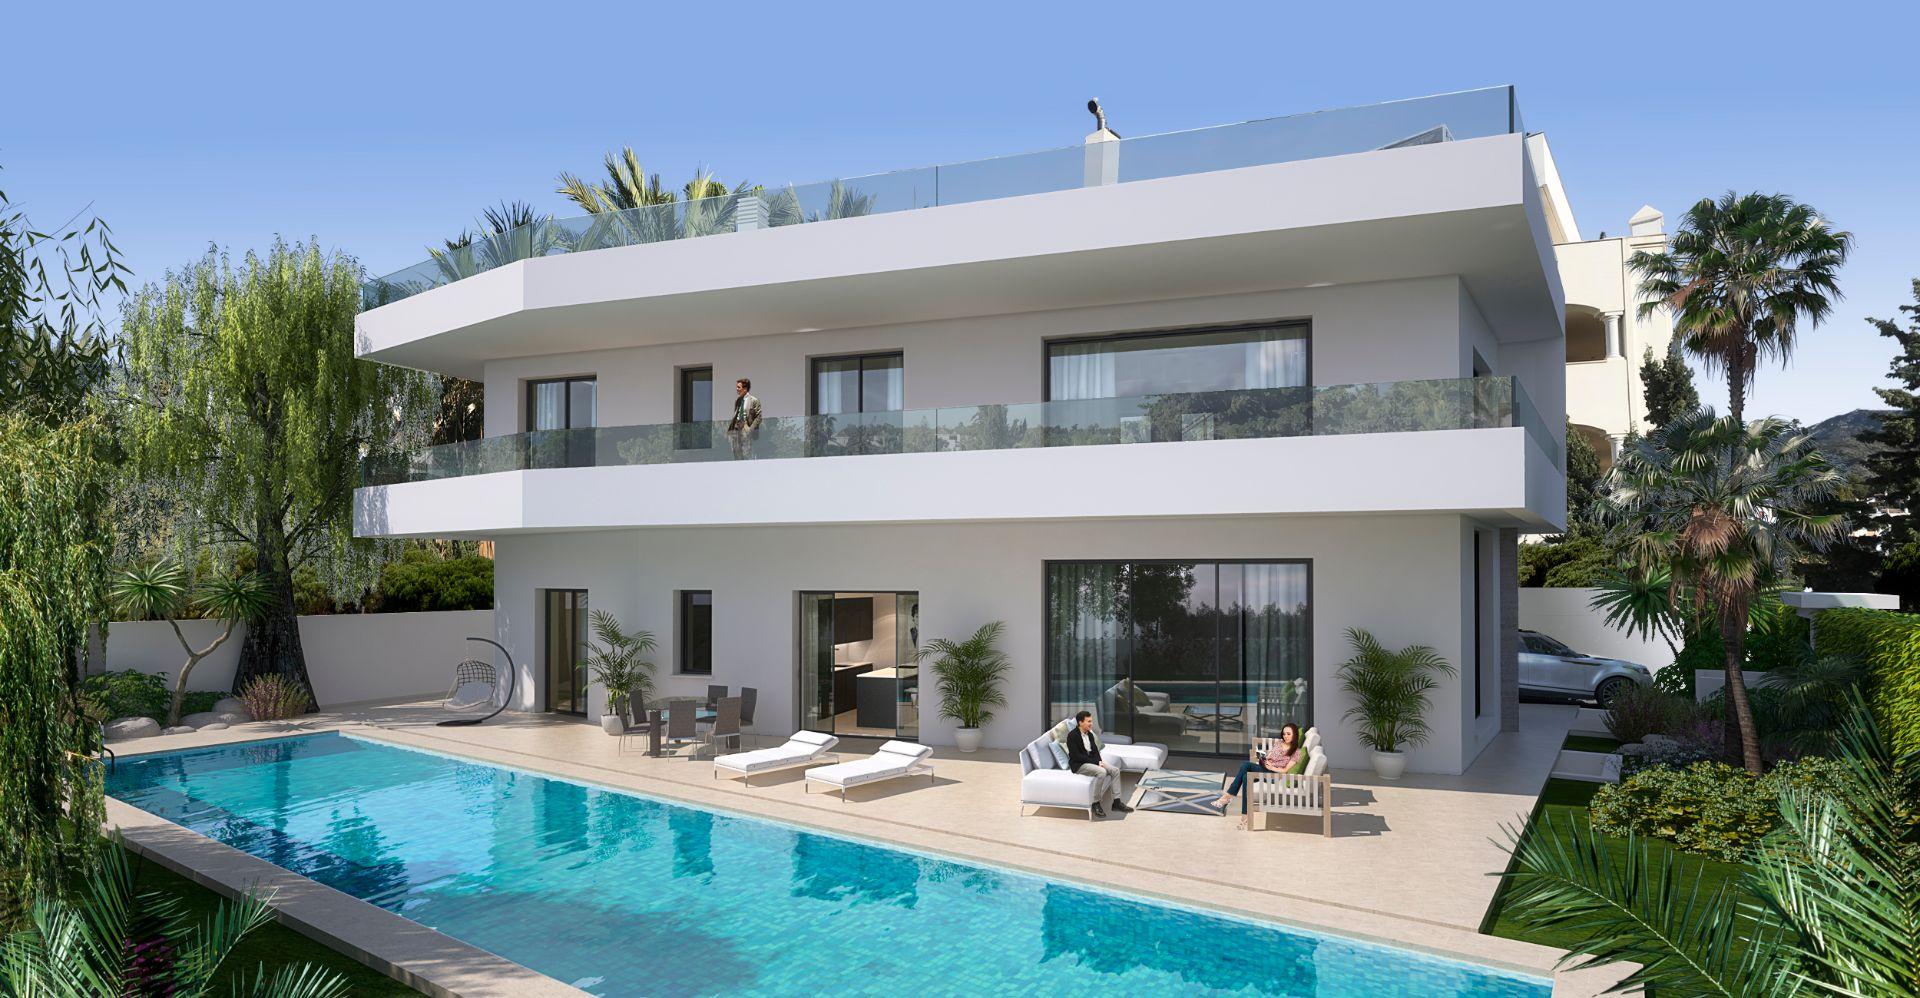 Вилла класса люкс в Marbella, Milla de Oro, продажа